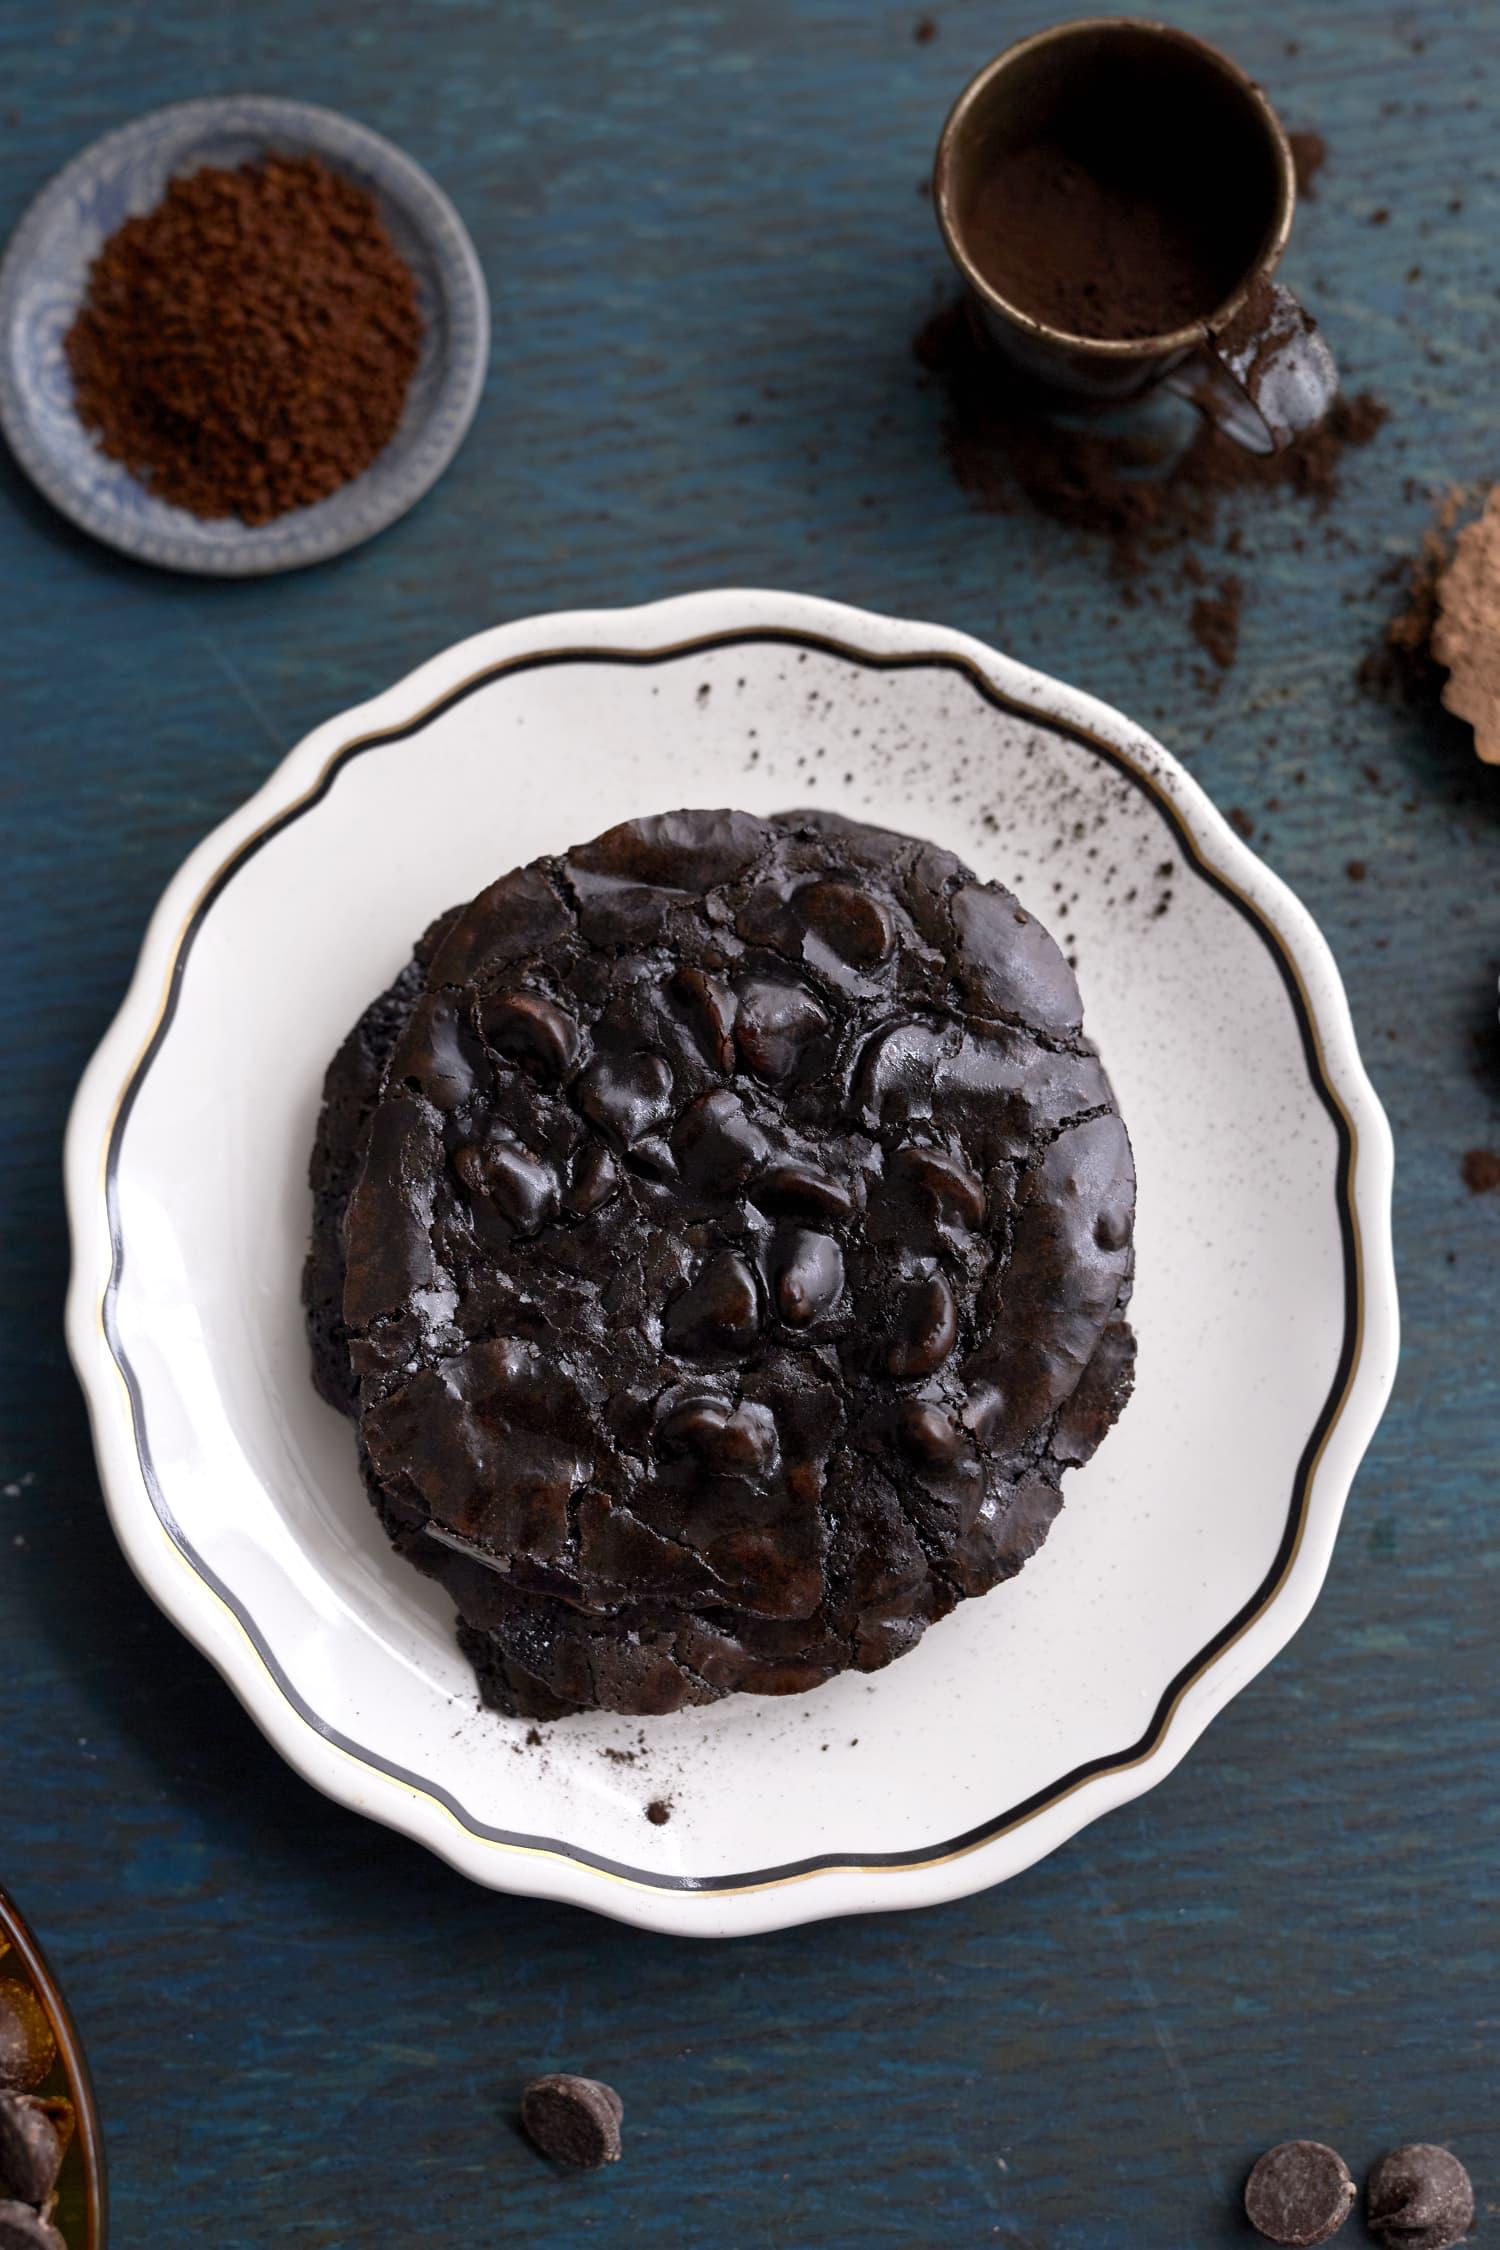 How To Make Flourless Chocolate Cookies